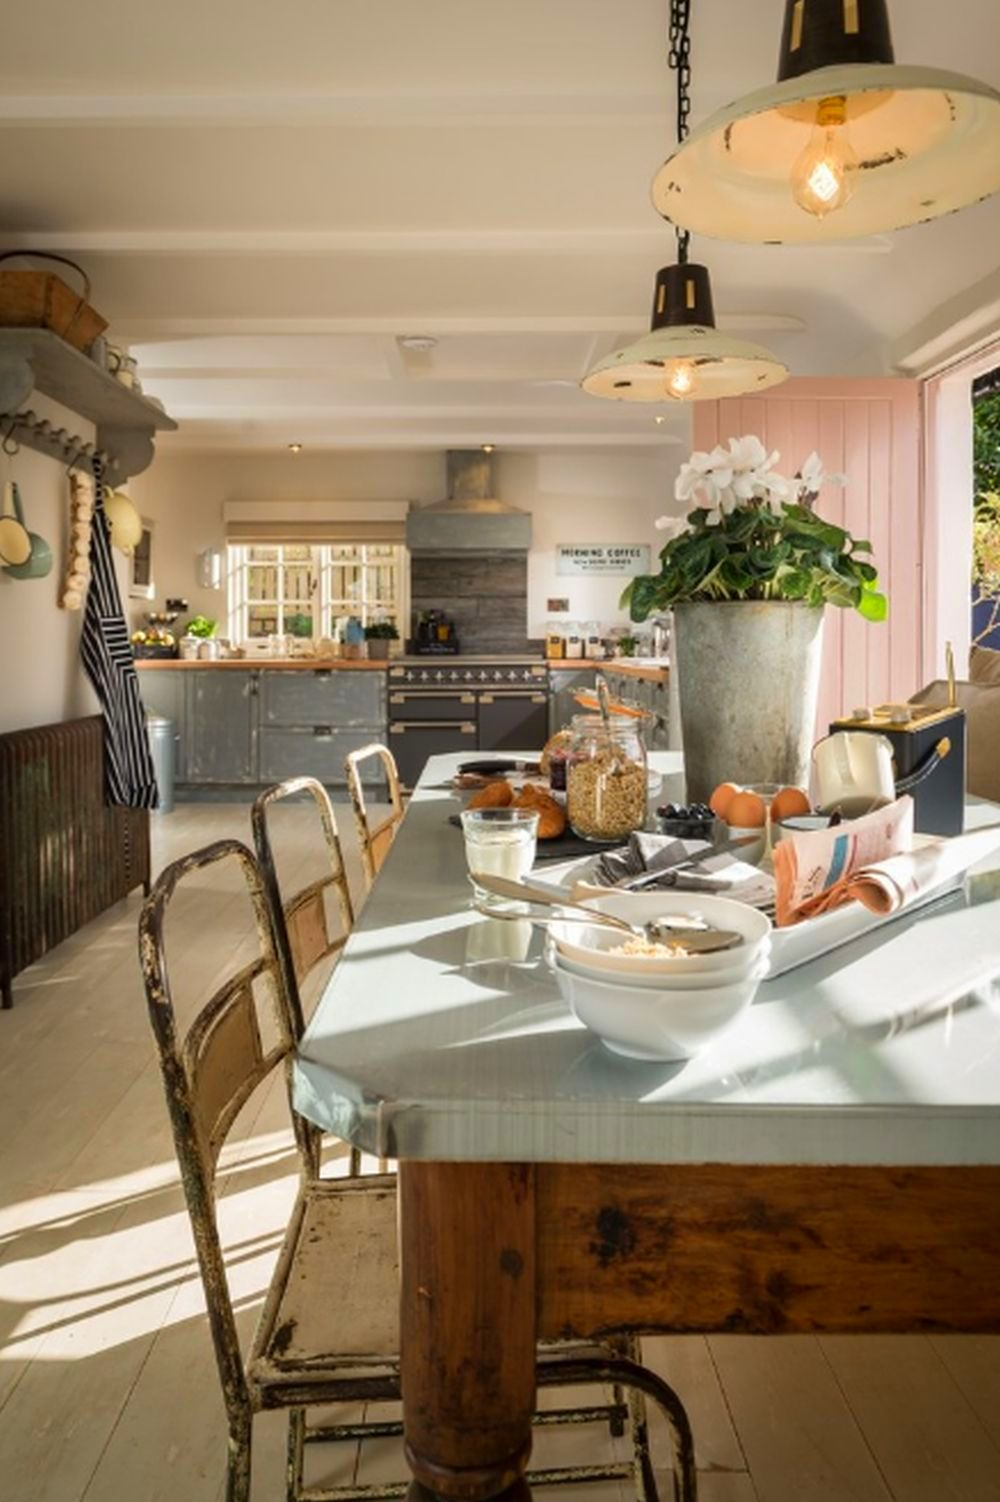 adelaparvu.com despre casa cu acoperis din stuf, casa UK, The Fable, Foto Unique Home Stays (4)